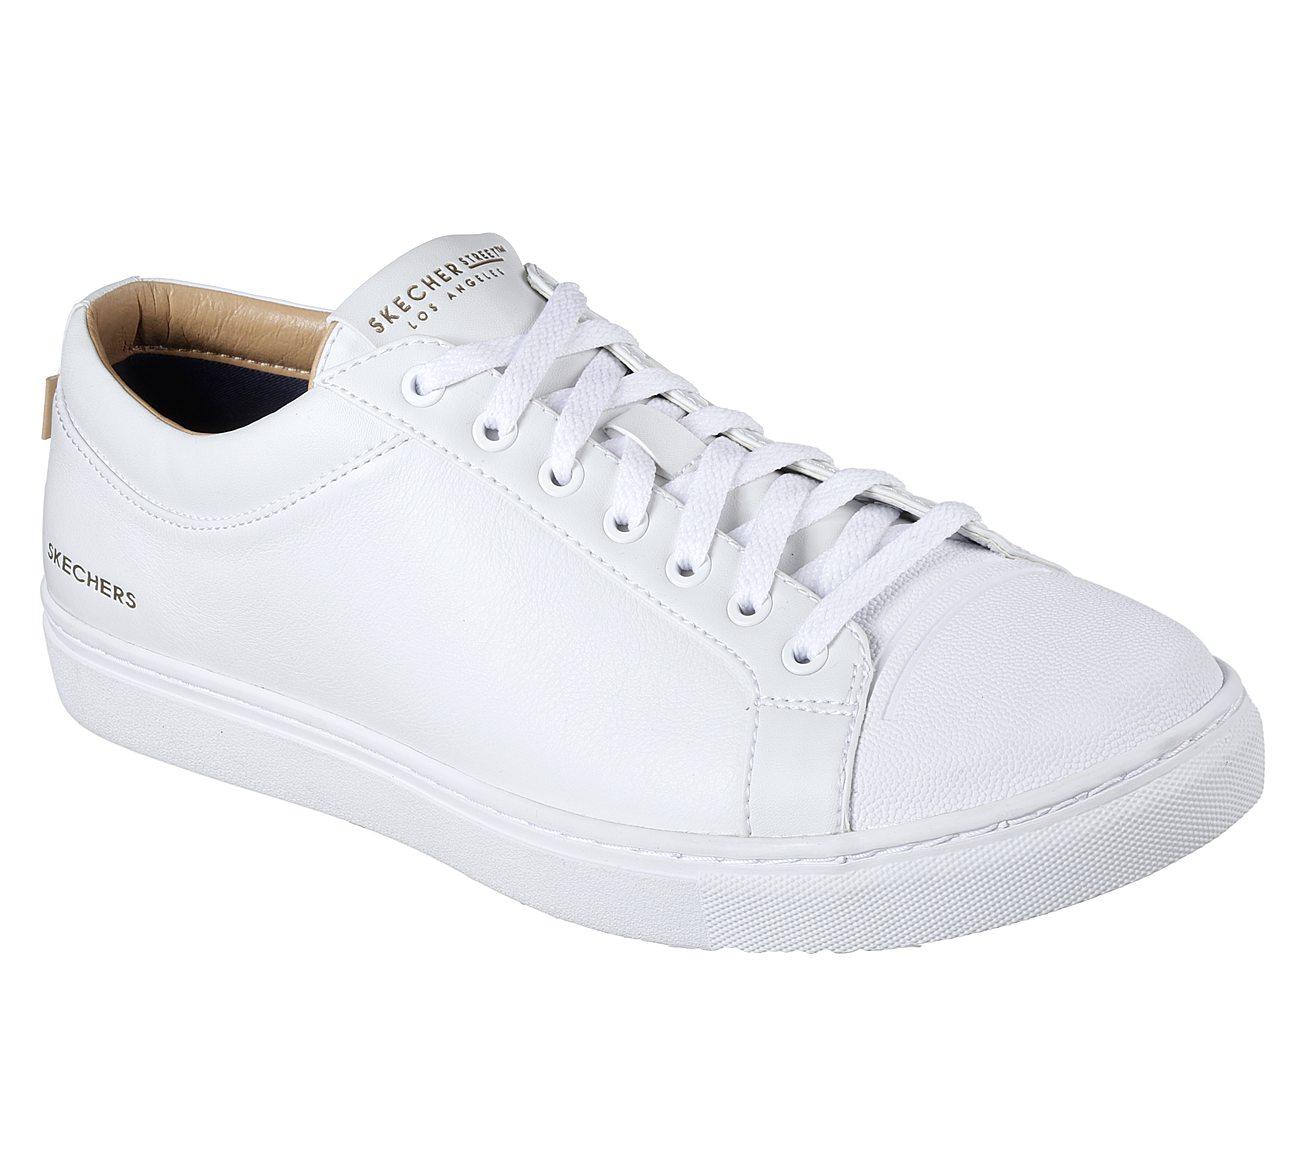 52dea7b525c Buy SKECHERS Venice - Santee Sport Shoes only  95.00